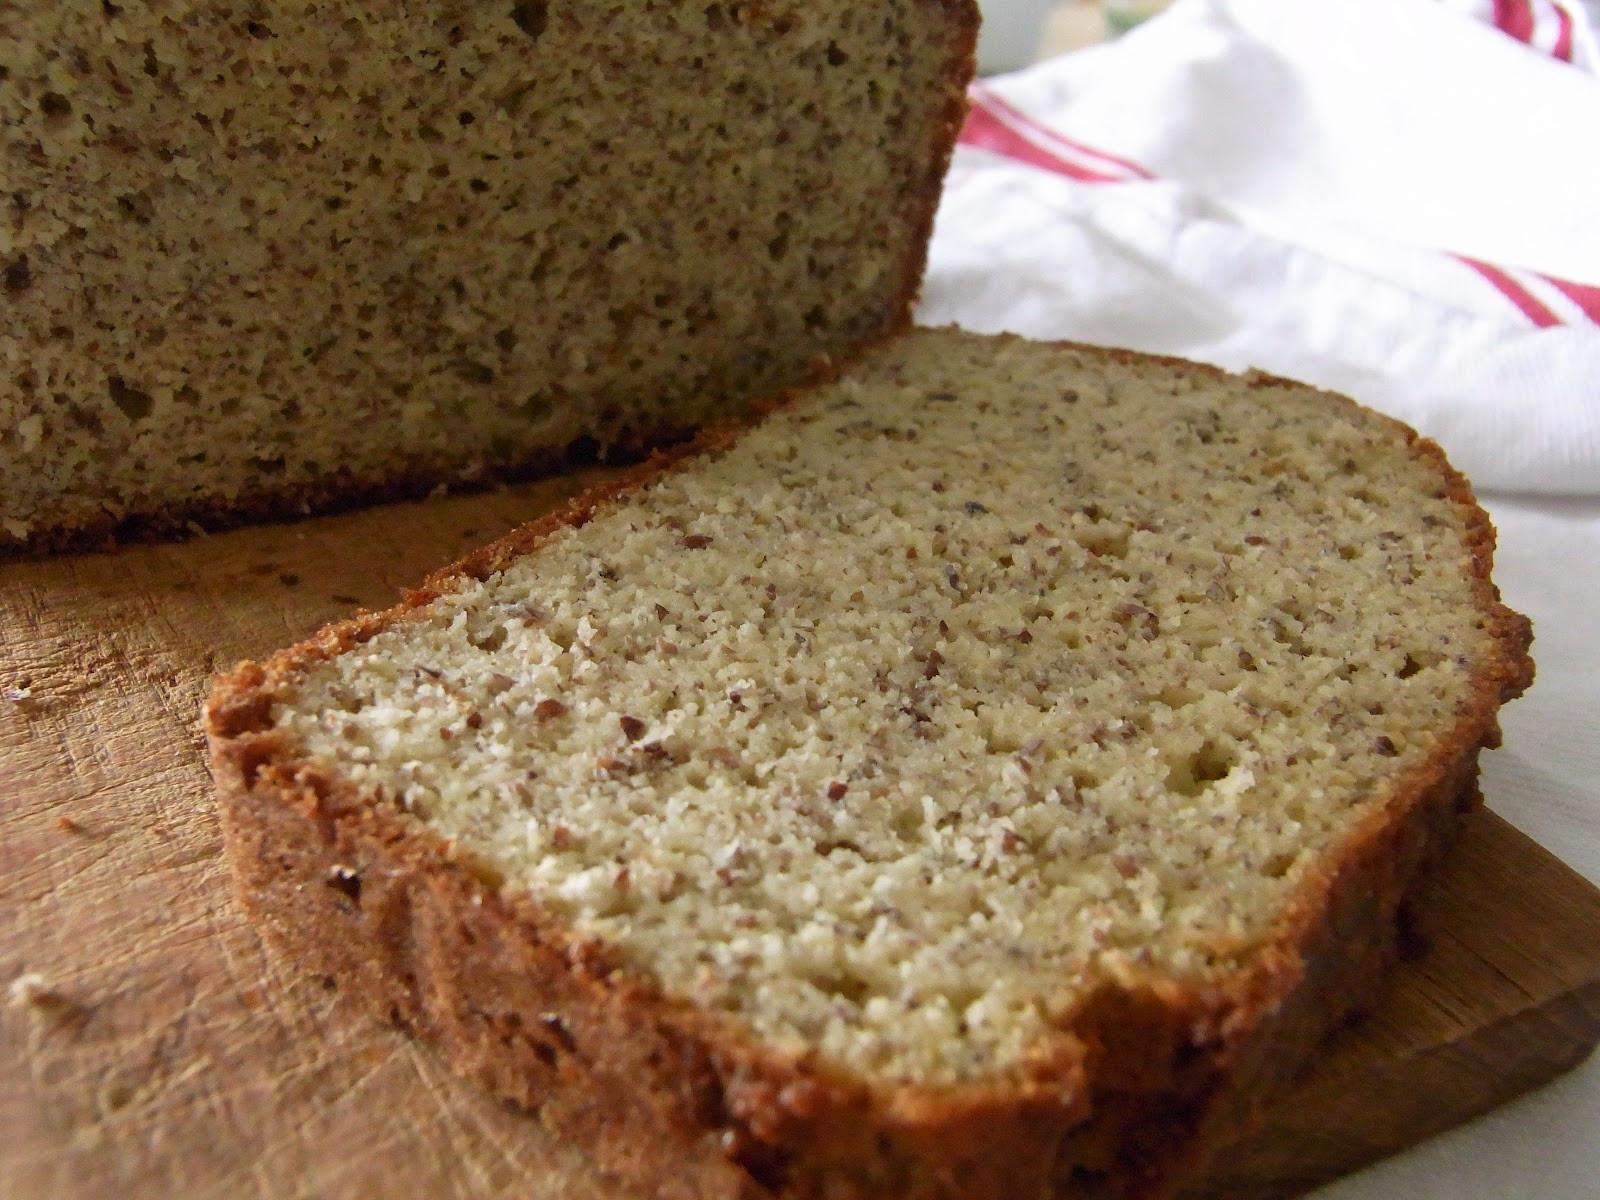 Grain Free Bread Recipe Almond Meal  Super Easy Herb Almond Bread Functional Medicine